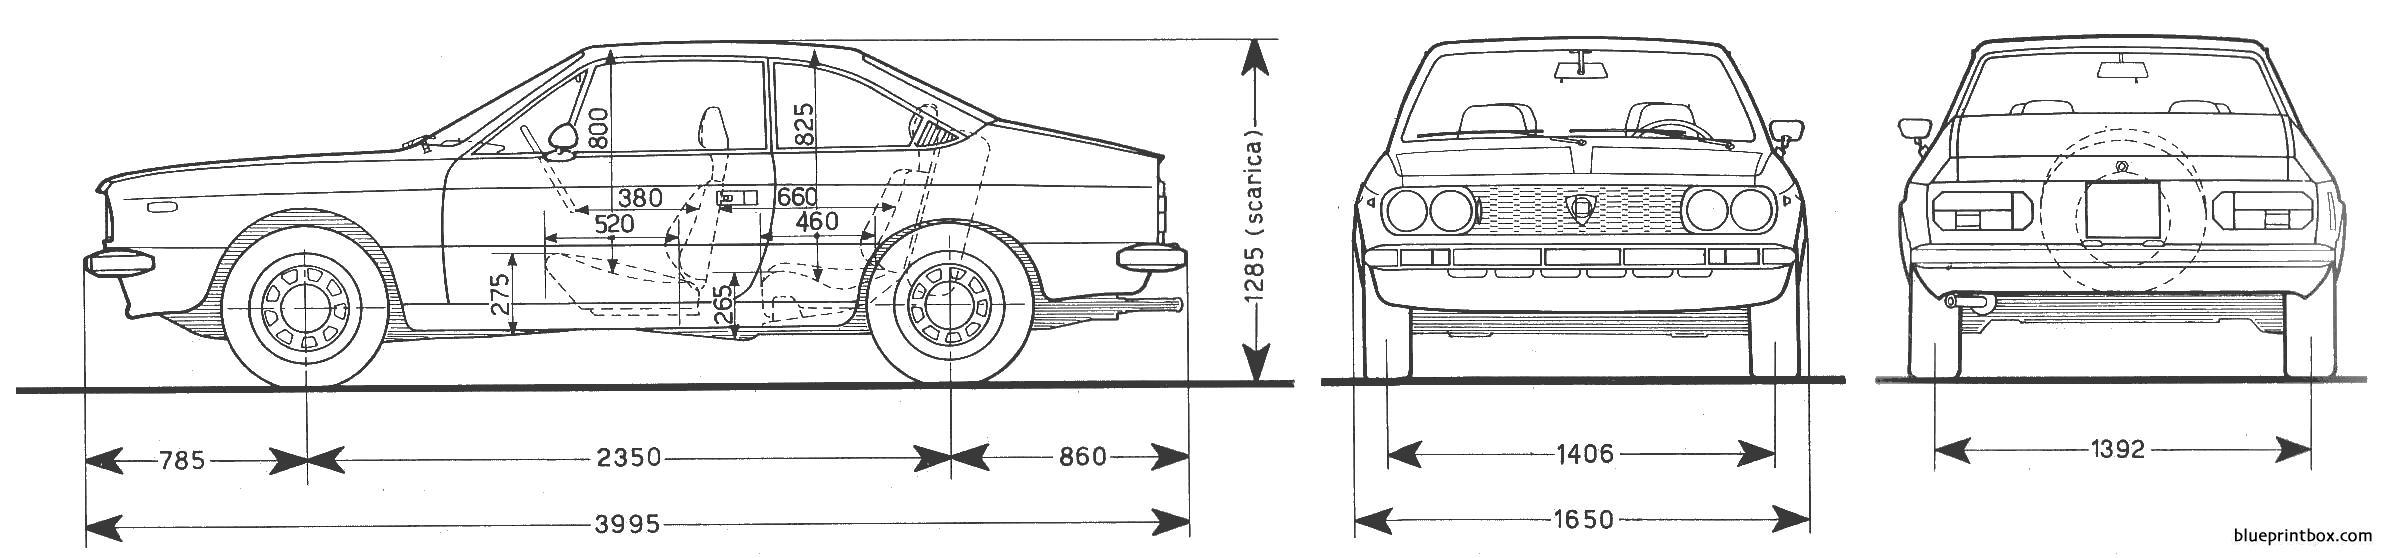 Lancia Beta Coupe 3 - Blueprintbox Com